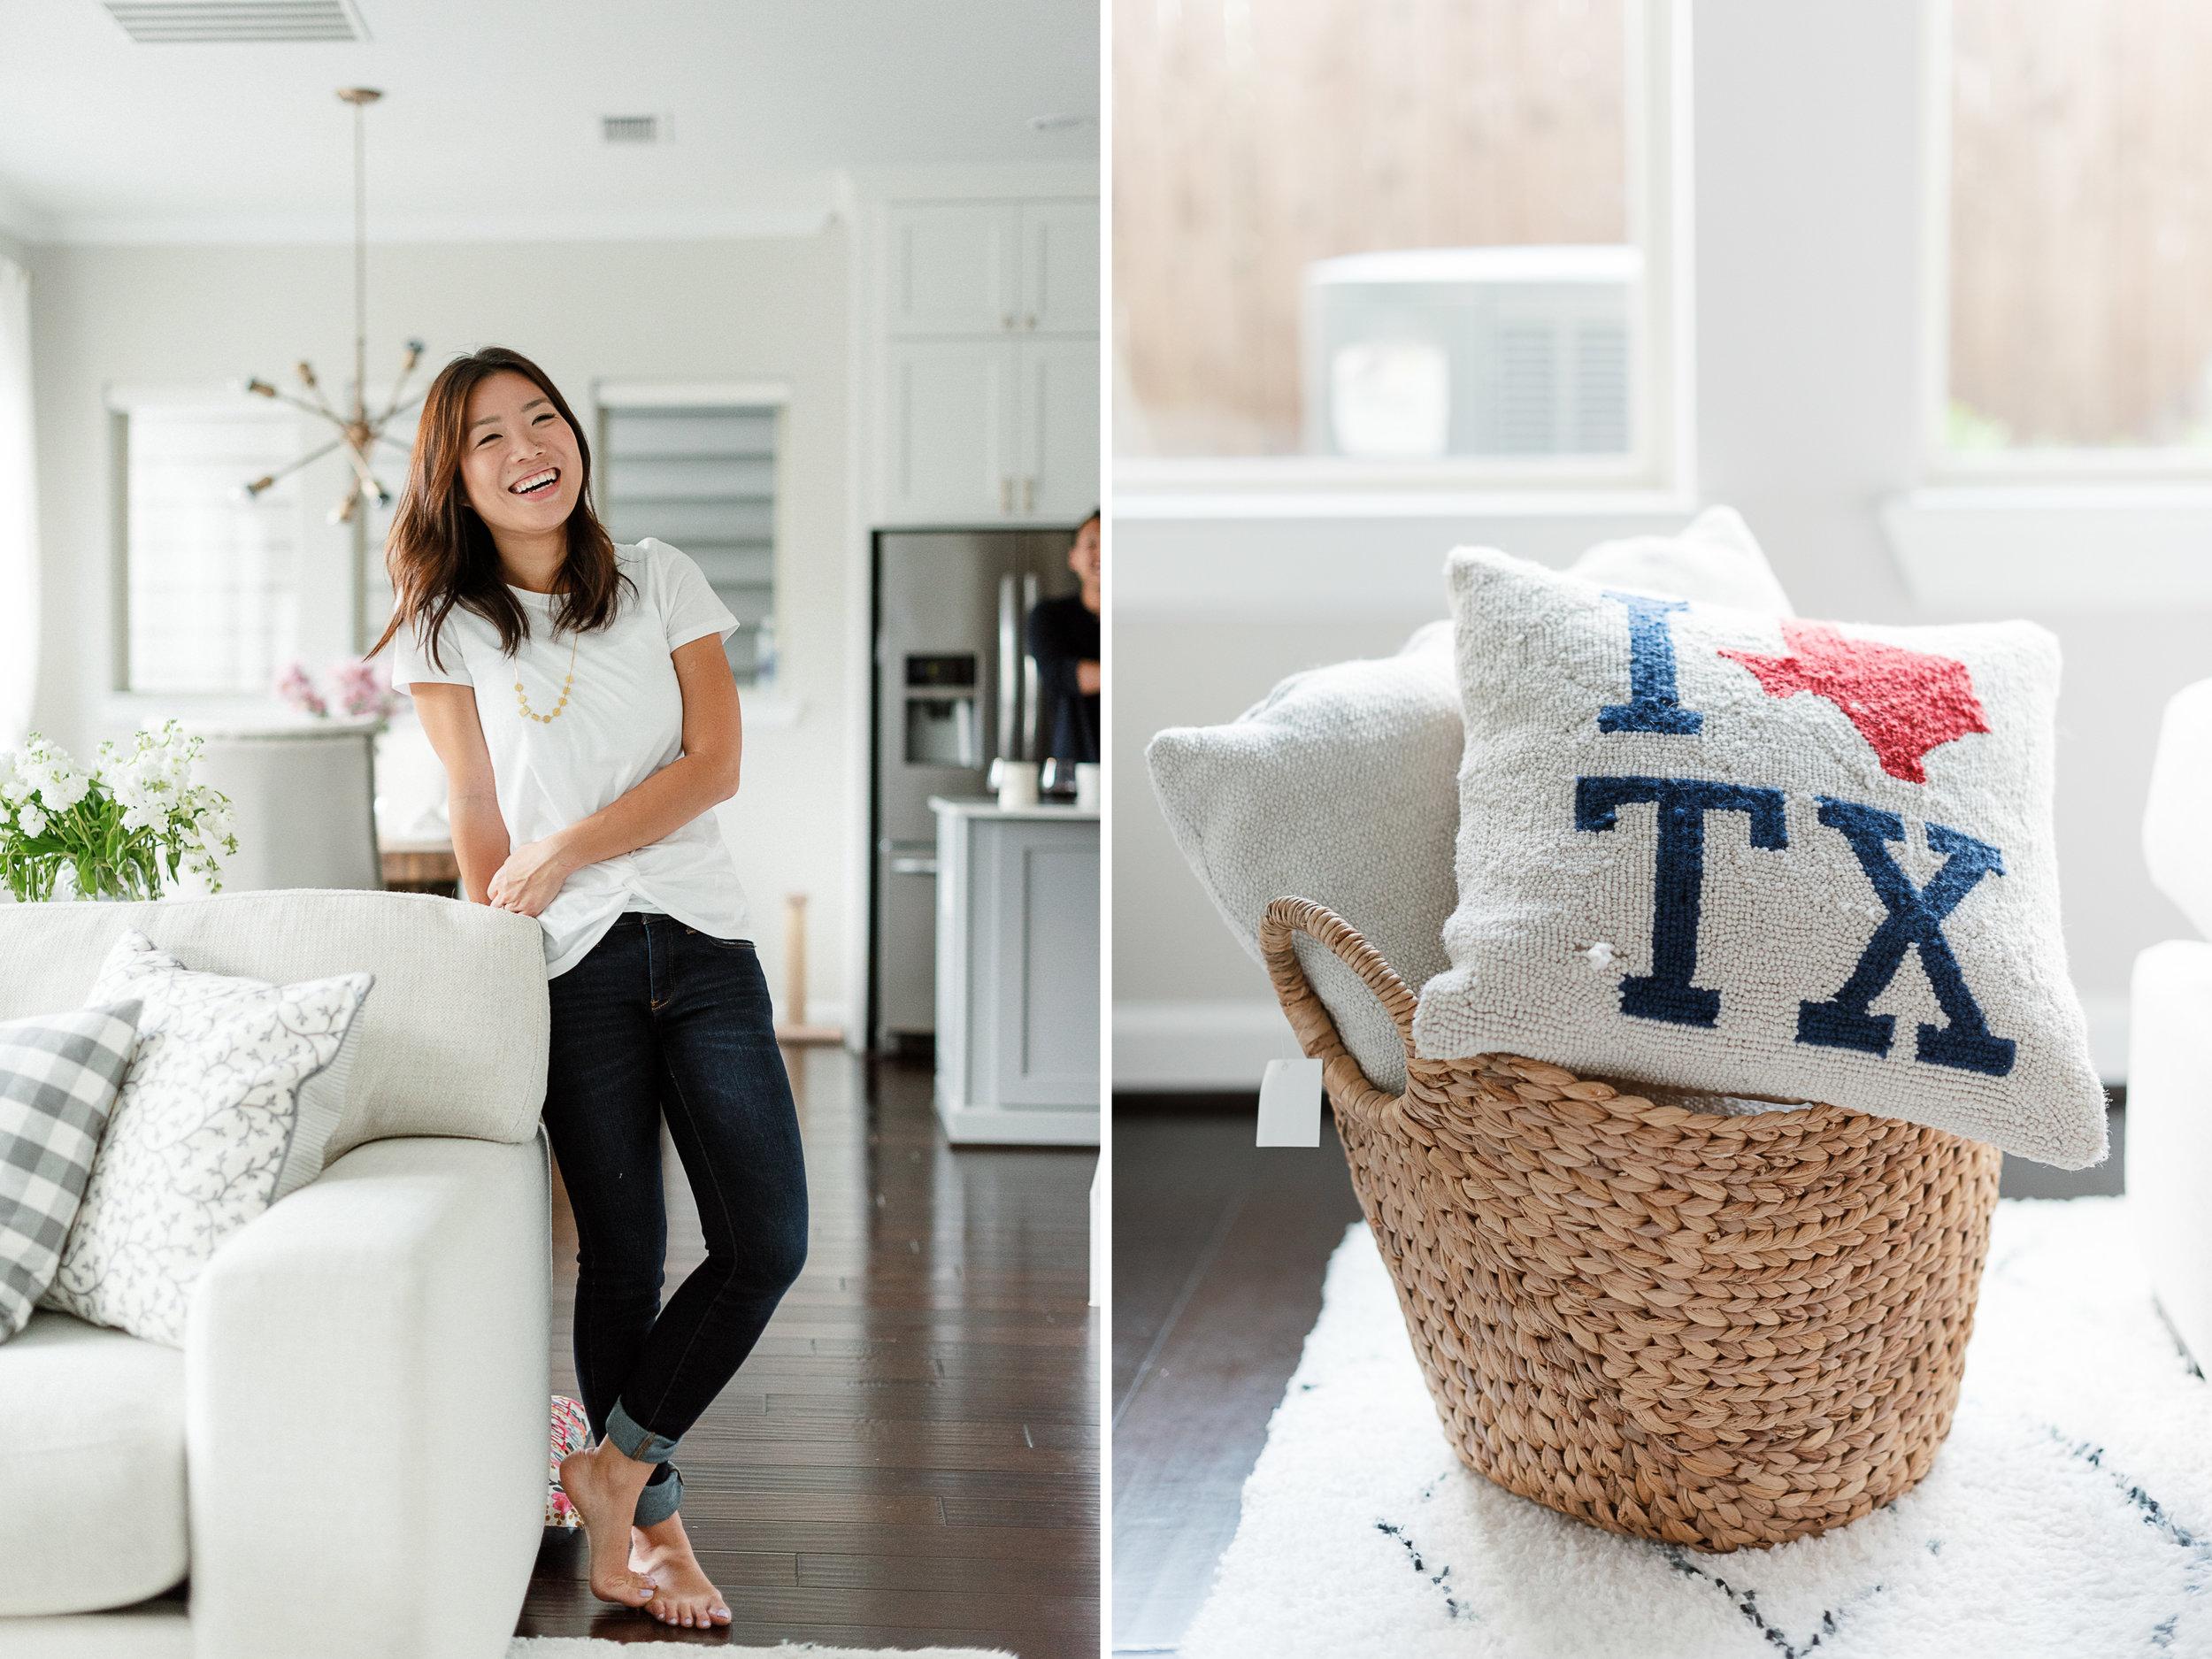 Houston-Wedding-Photographer-Best-Top-Luxury-Destination-Engagements-Portrait-Austin-Photography-108.jpg